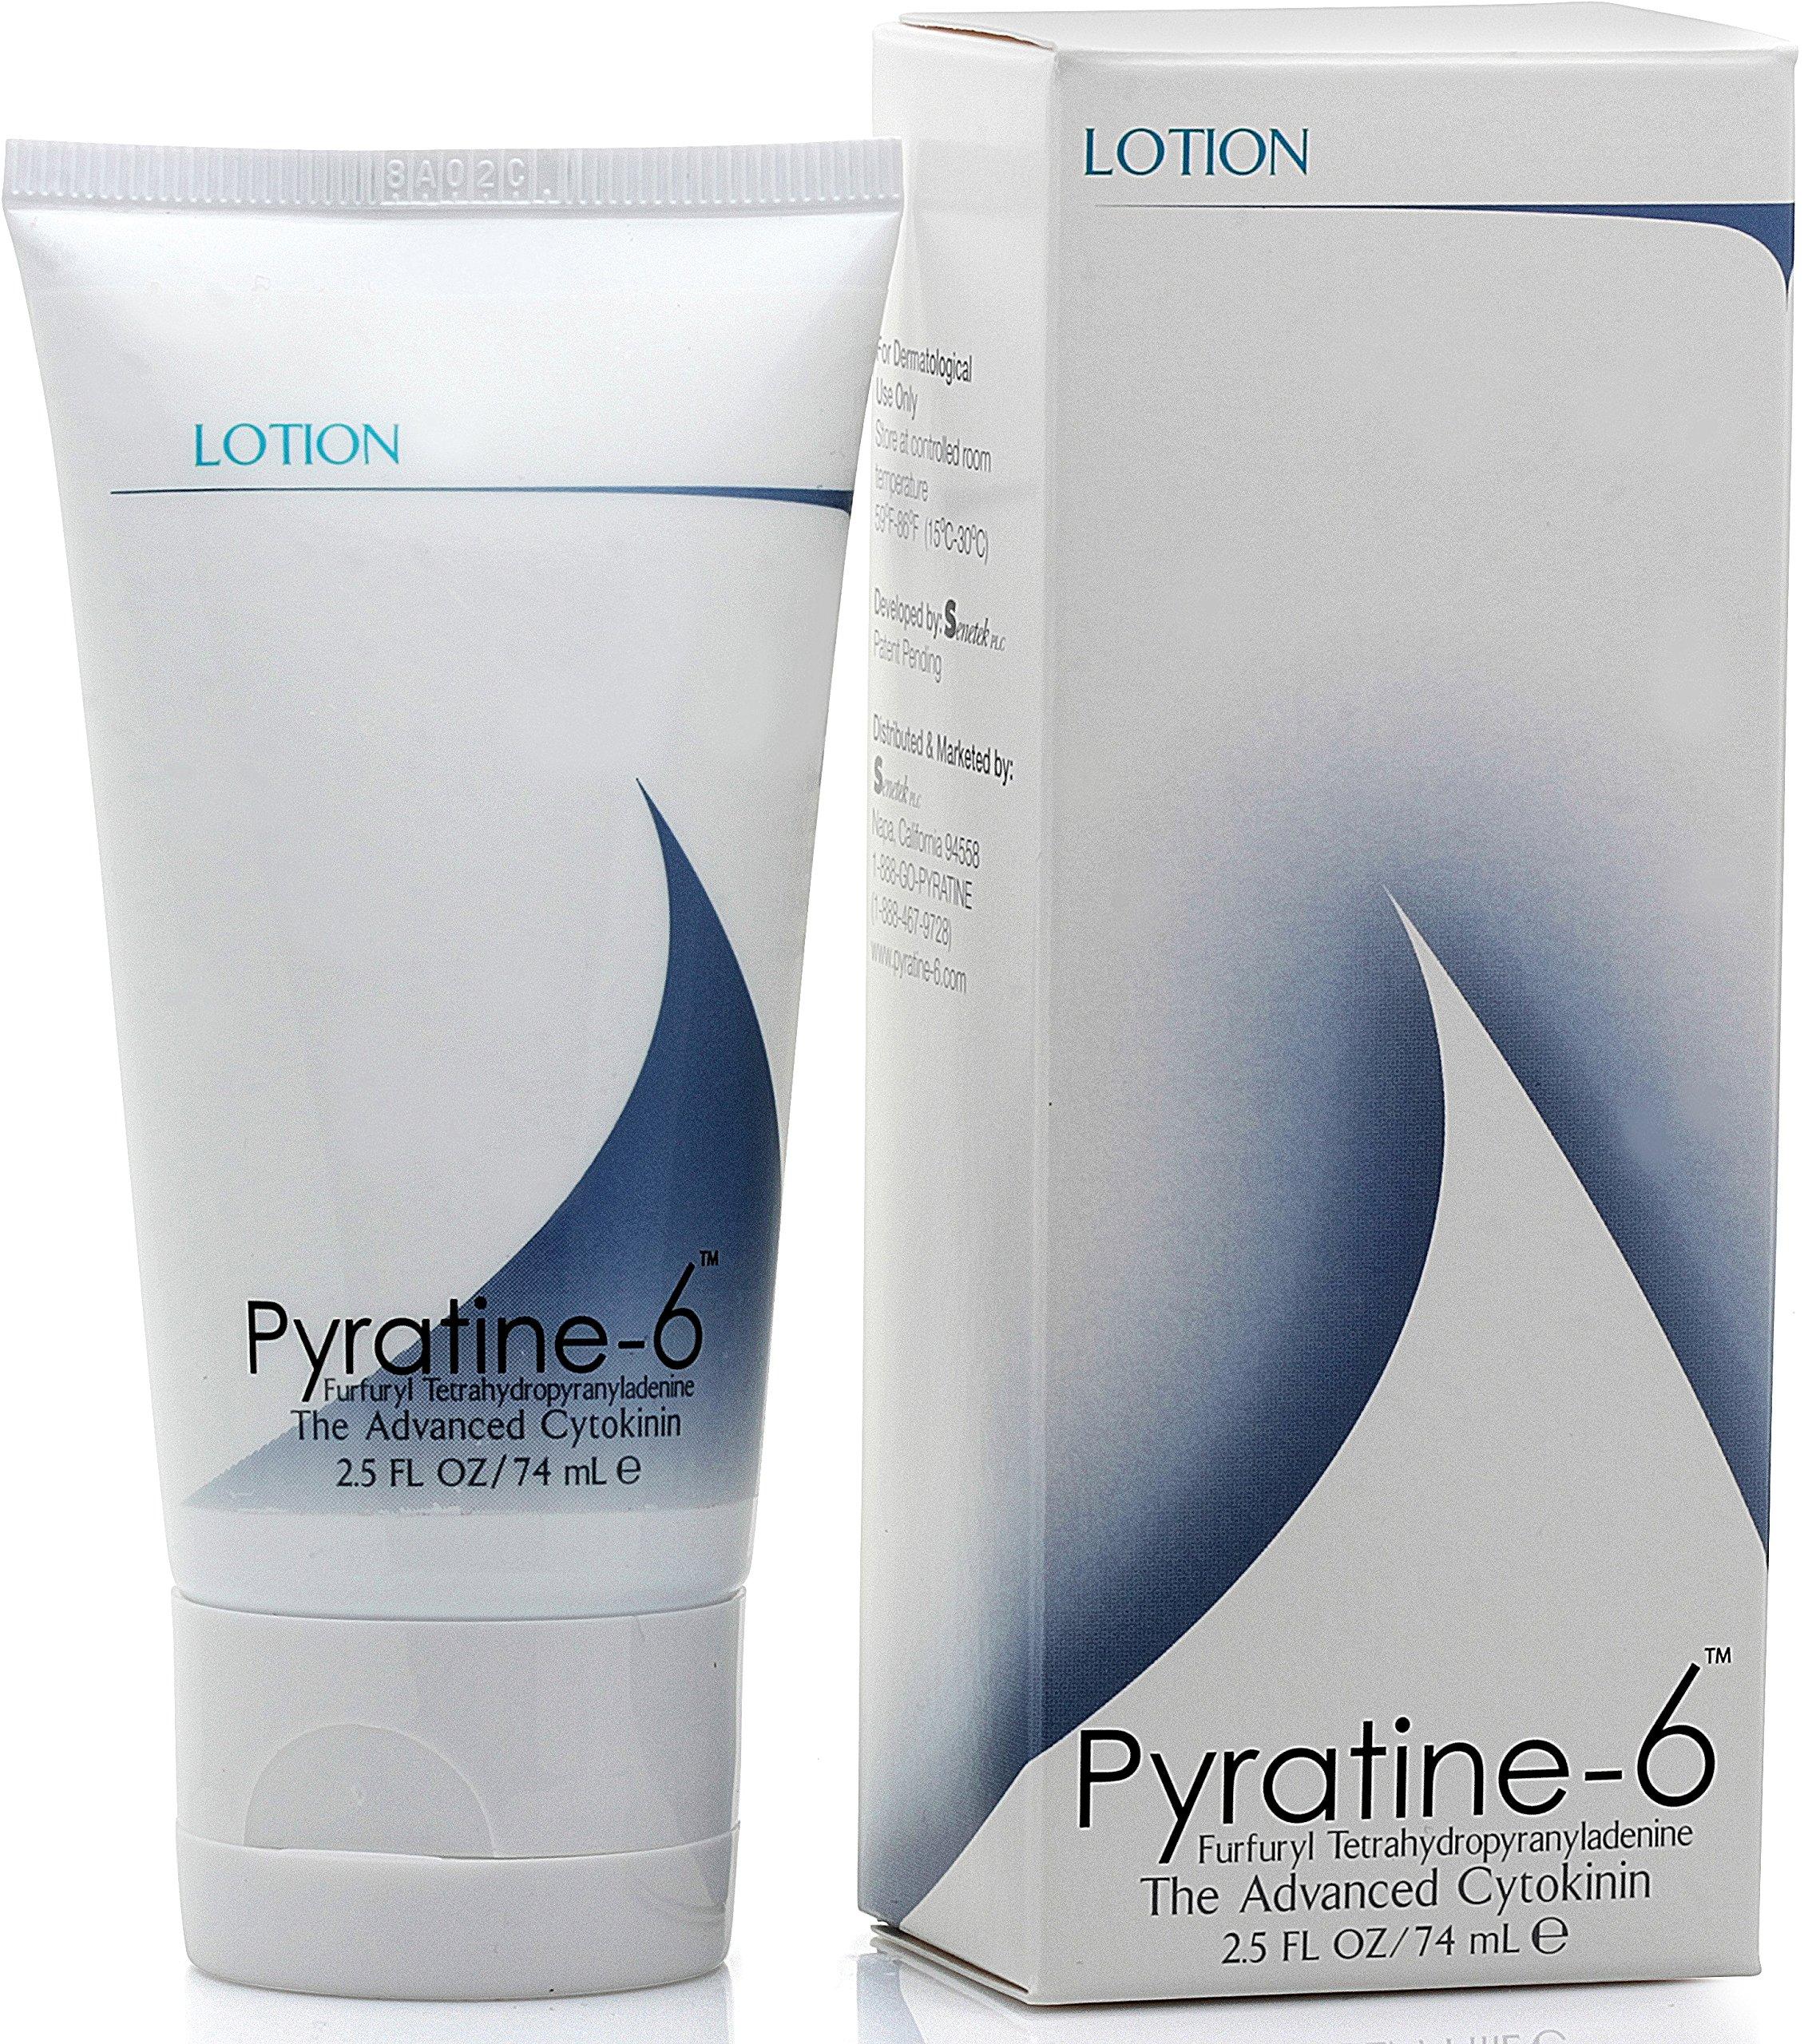 Pyratine-6 Lotion (2.5 oz)